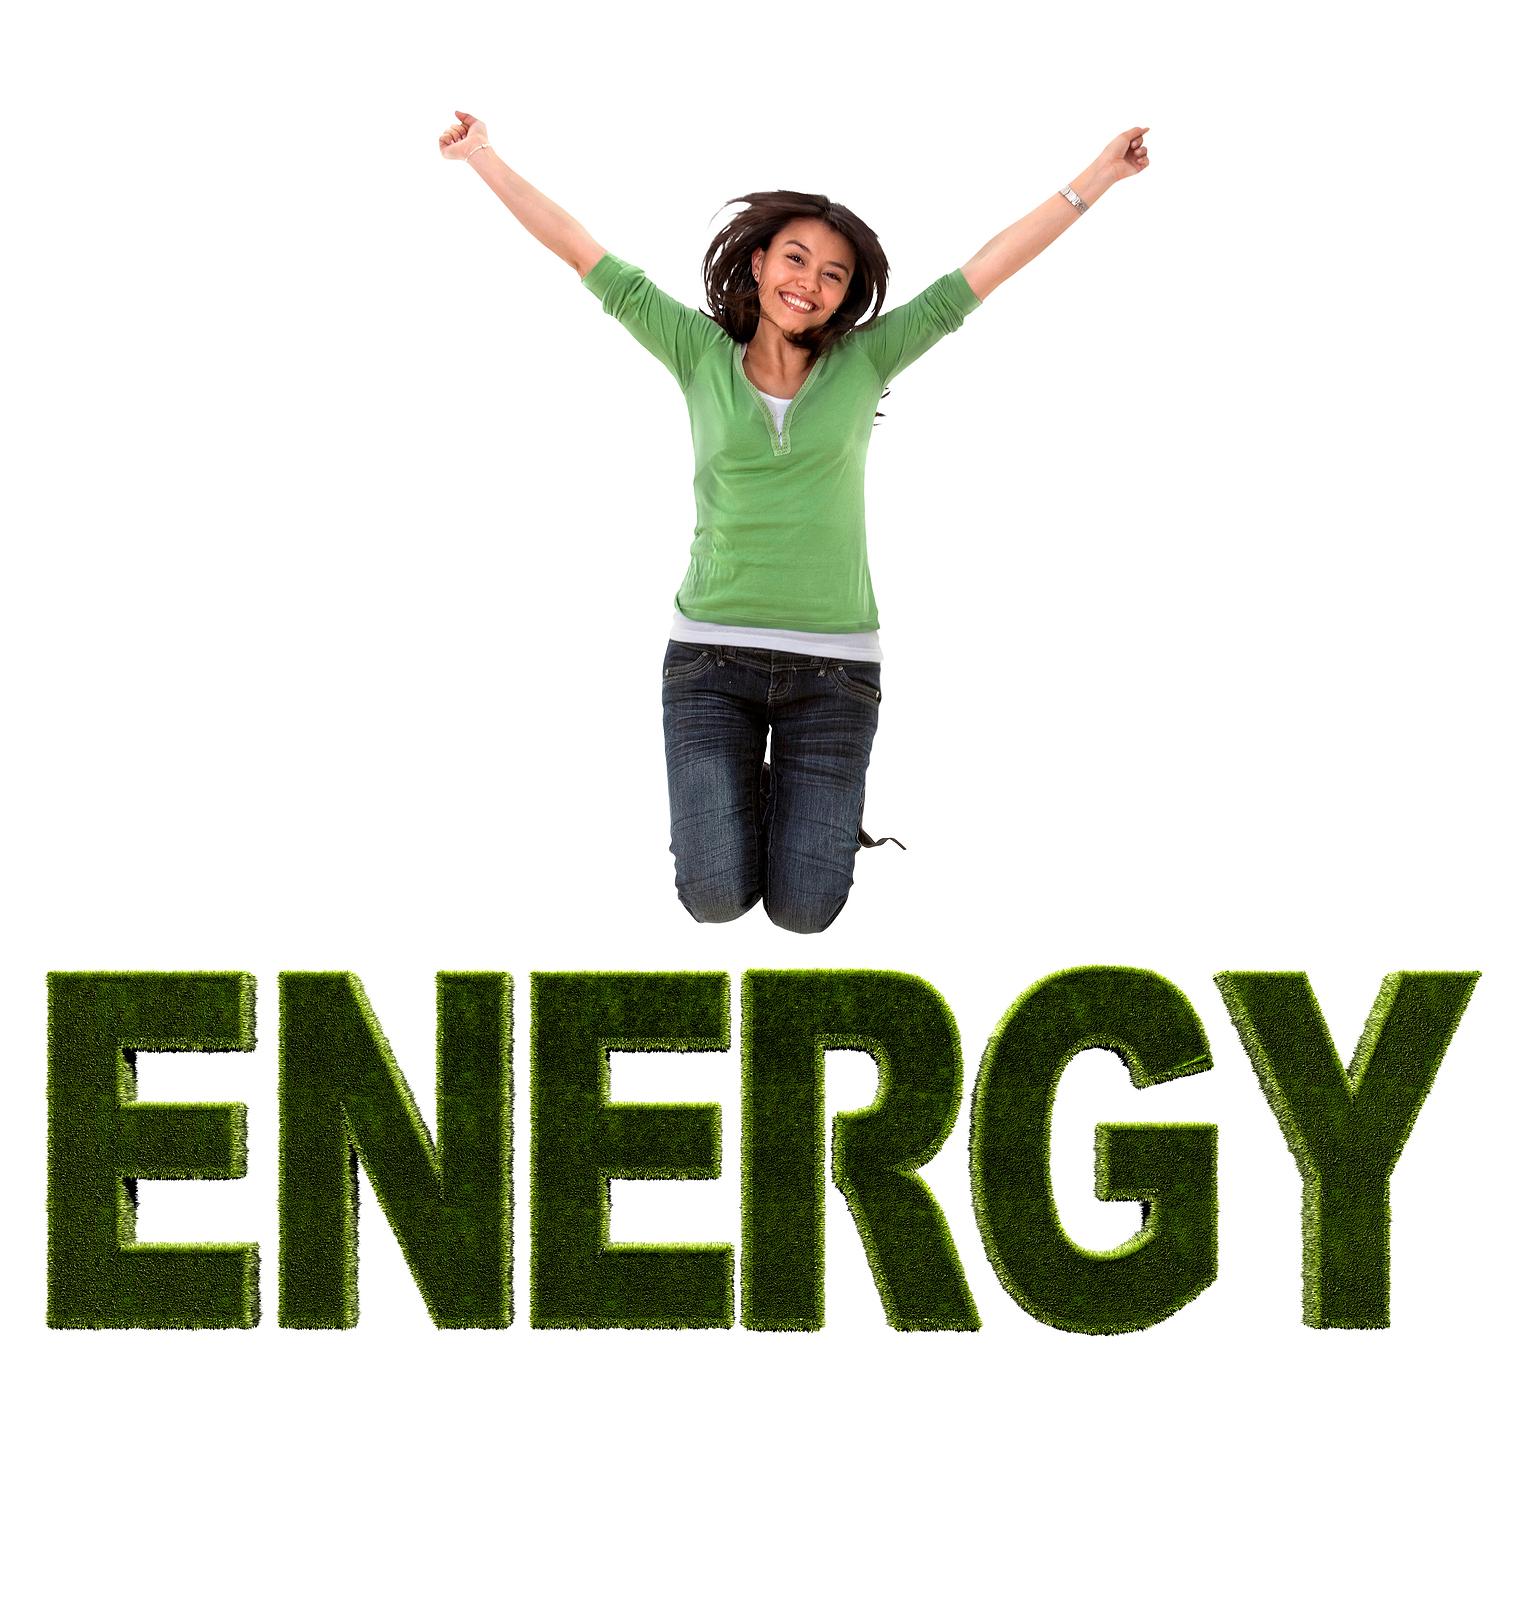 i am energetic